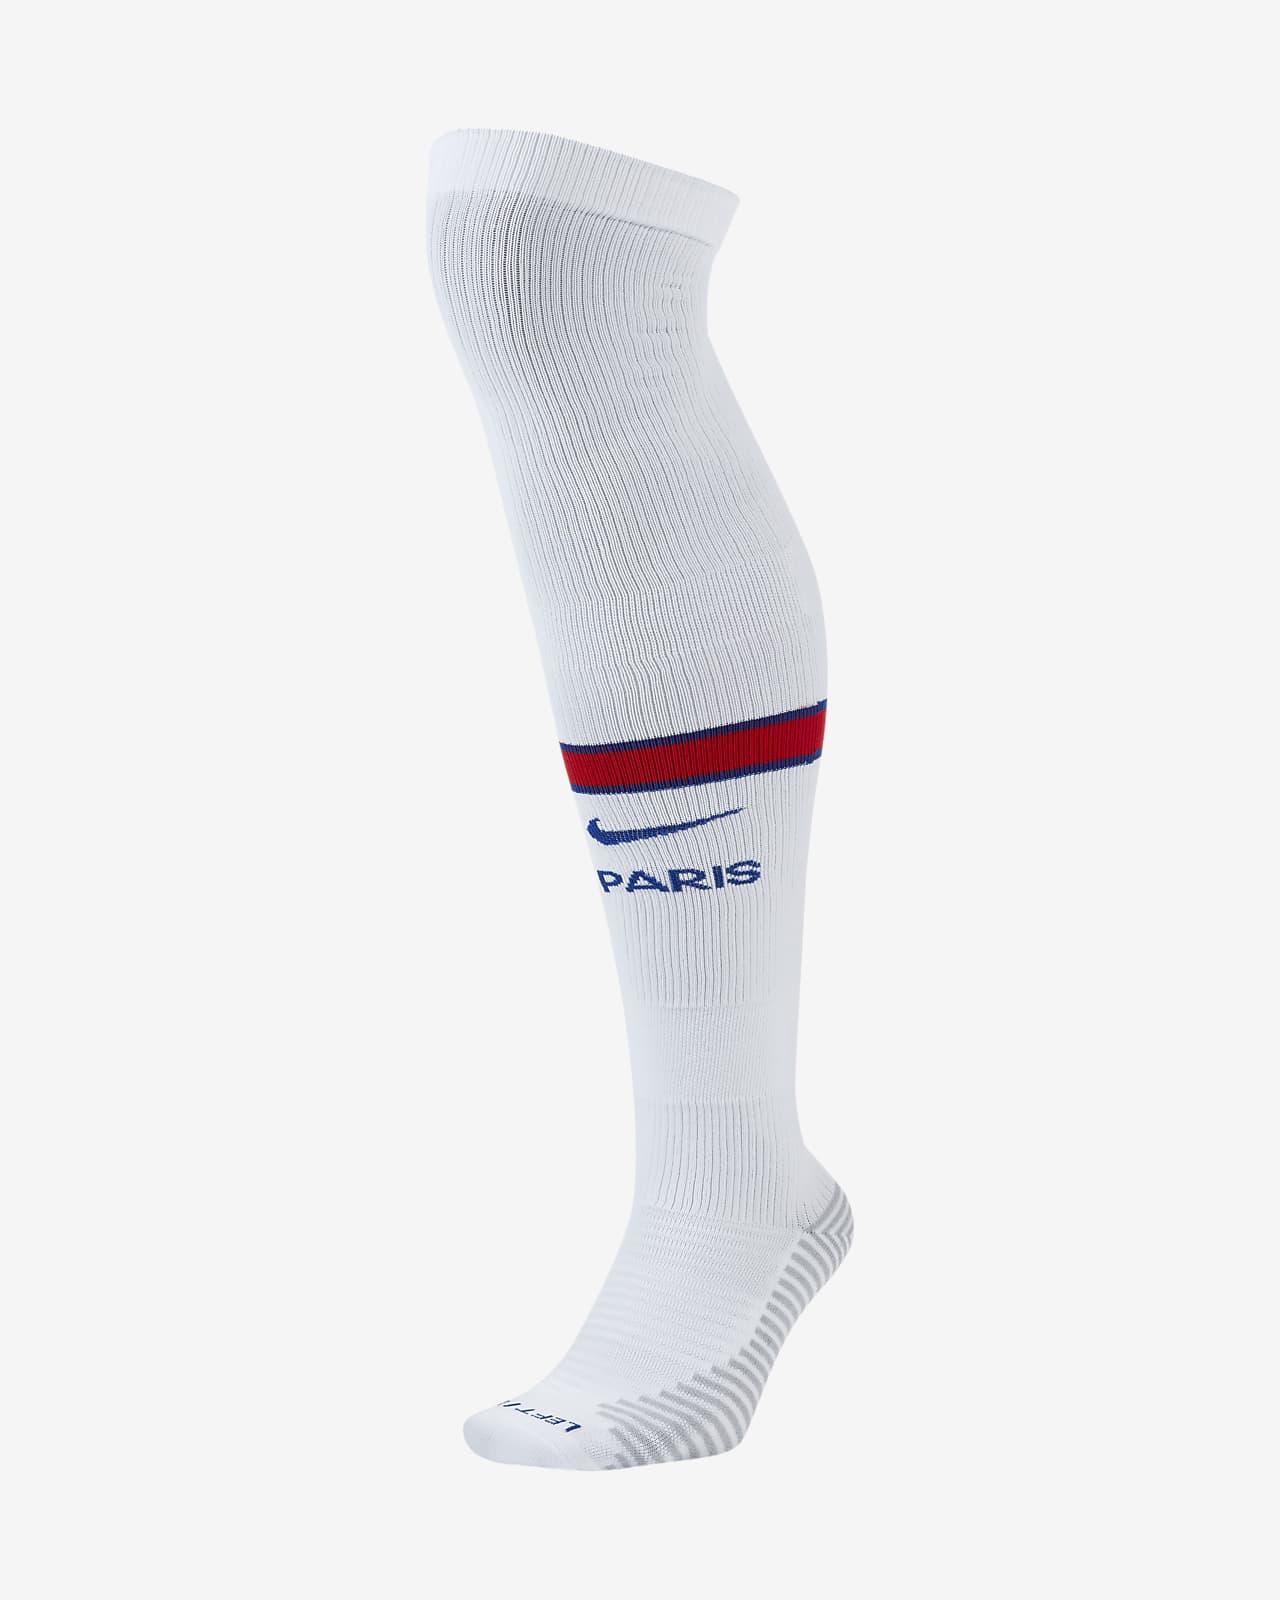 Paris Saint-Germain 2020/21 Stadium Home/Away Over-the-Calf Football Socks